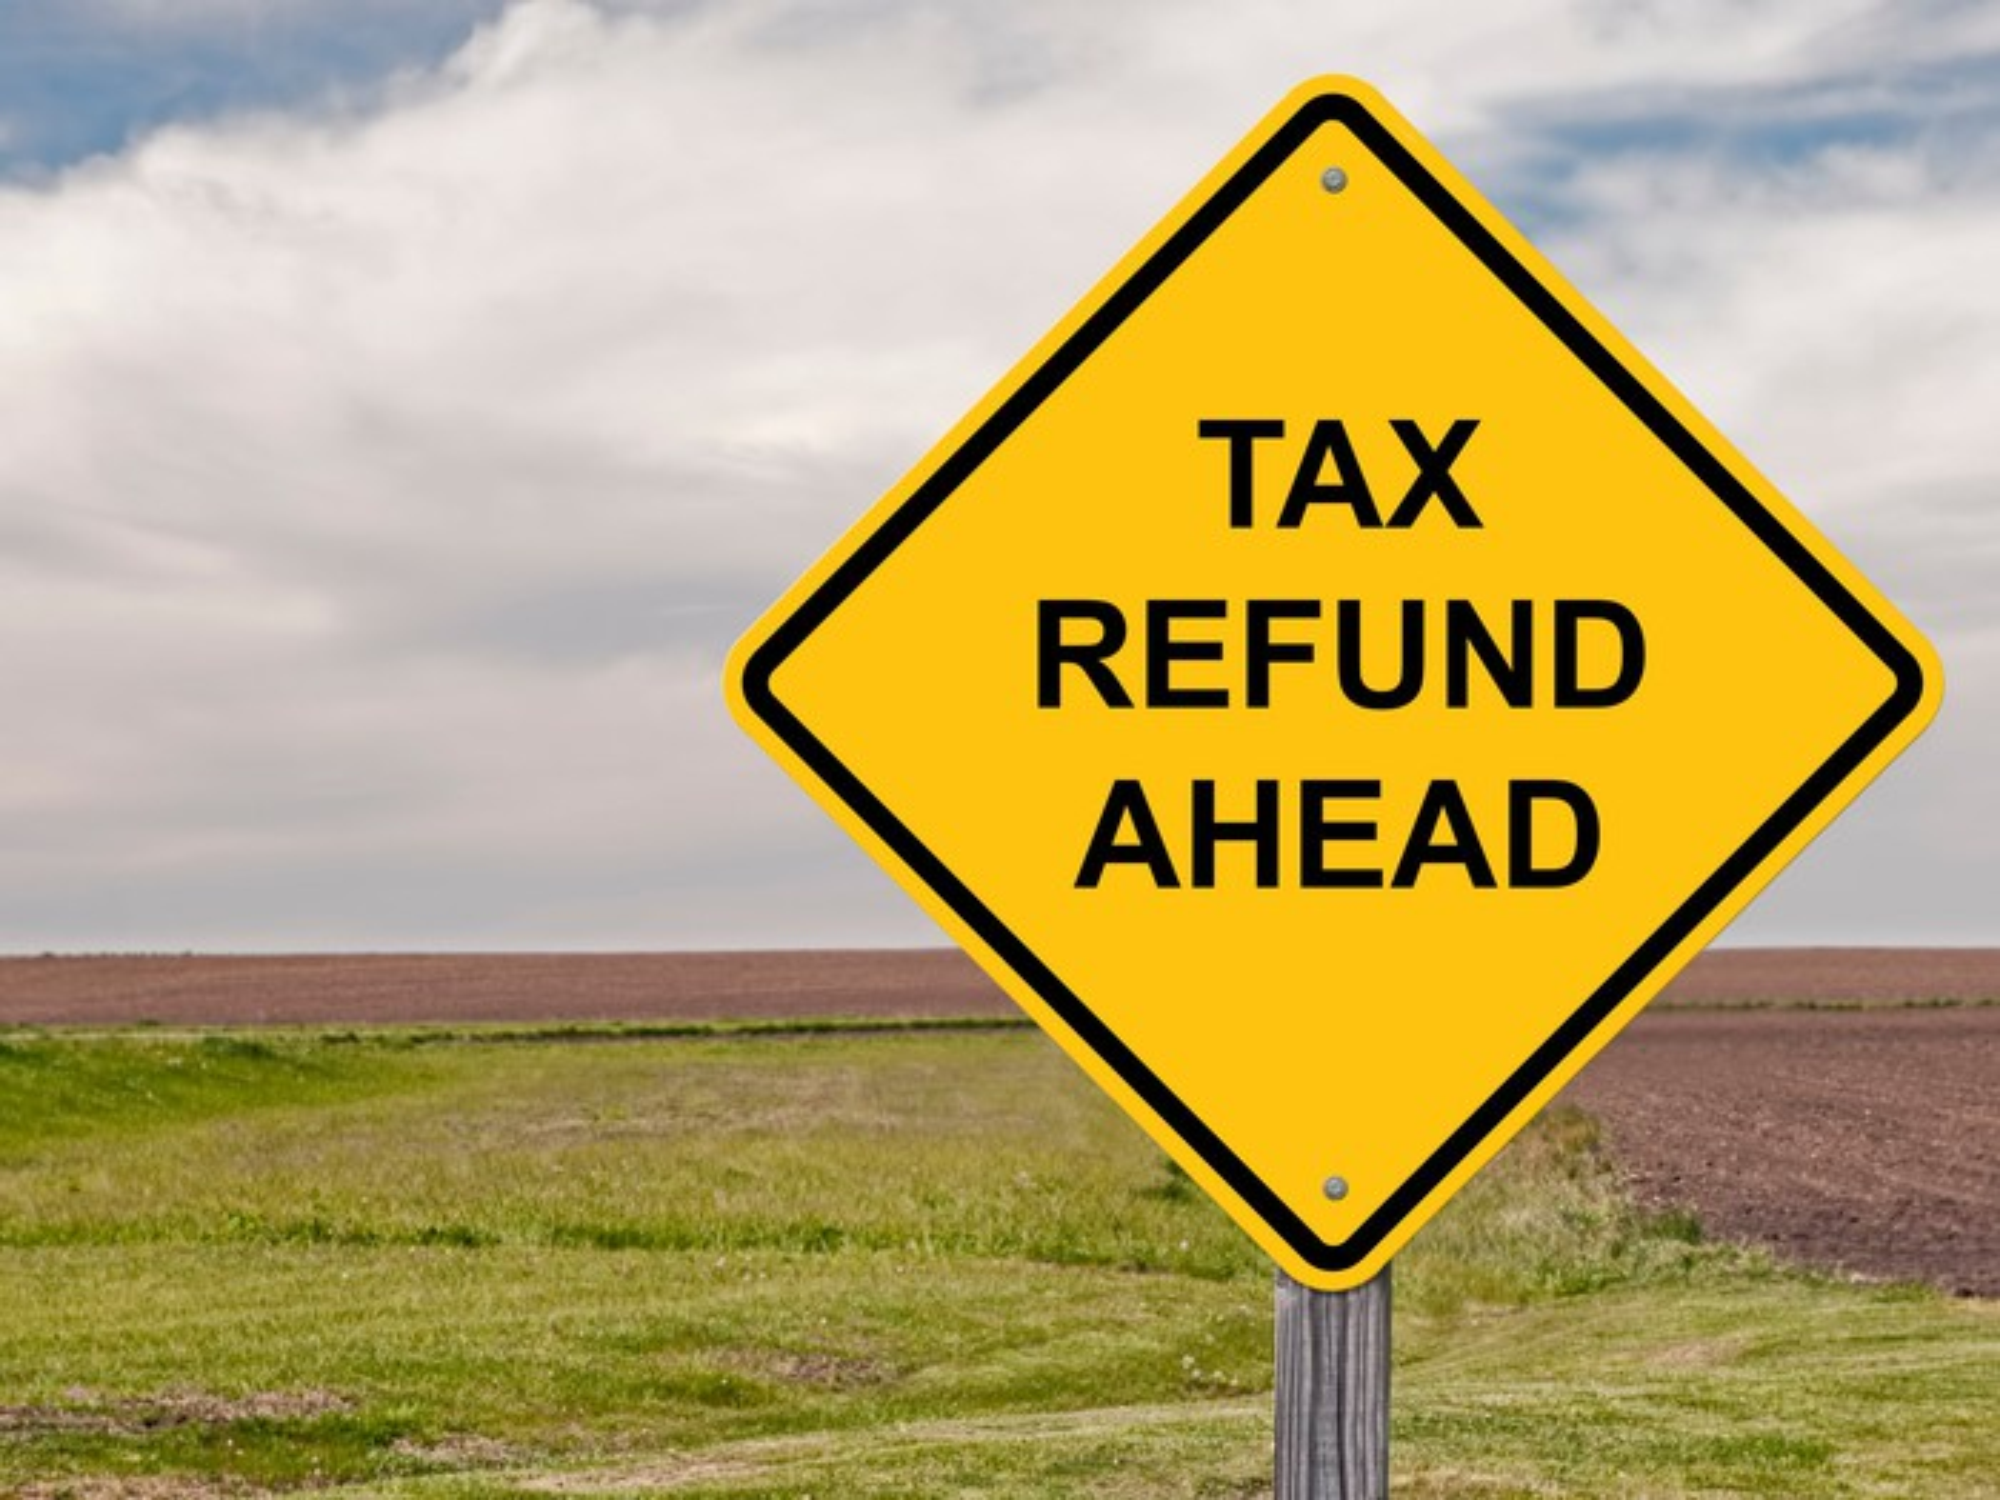 Tax Refund Ahead road sign